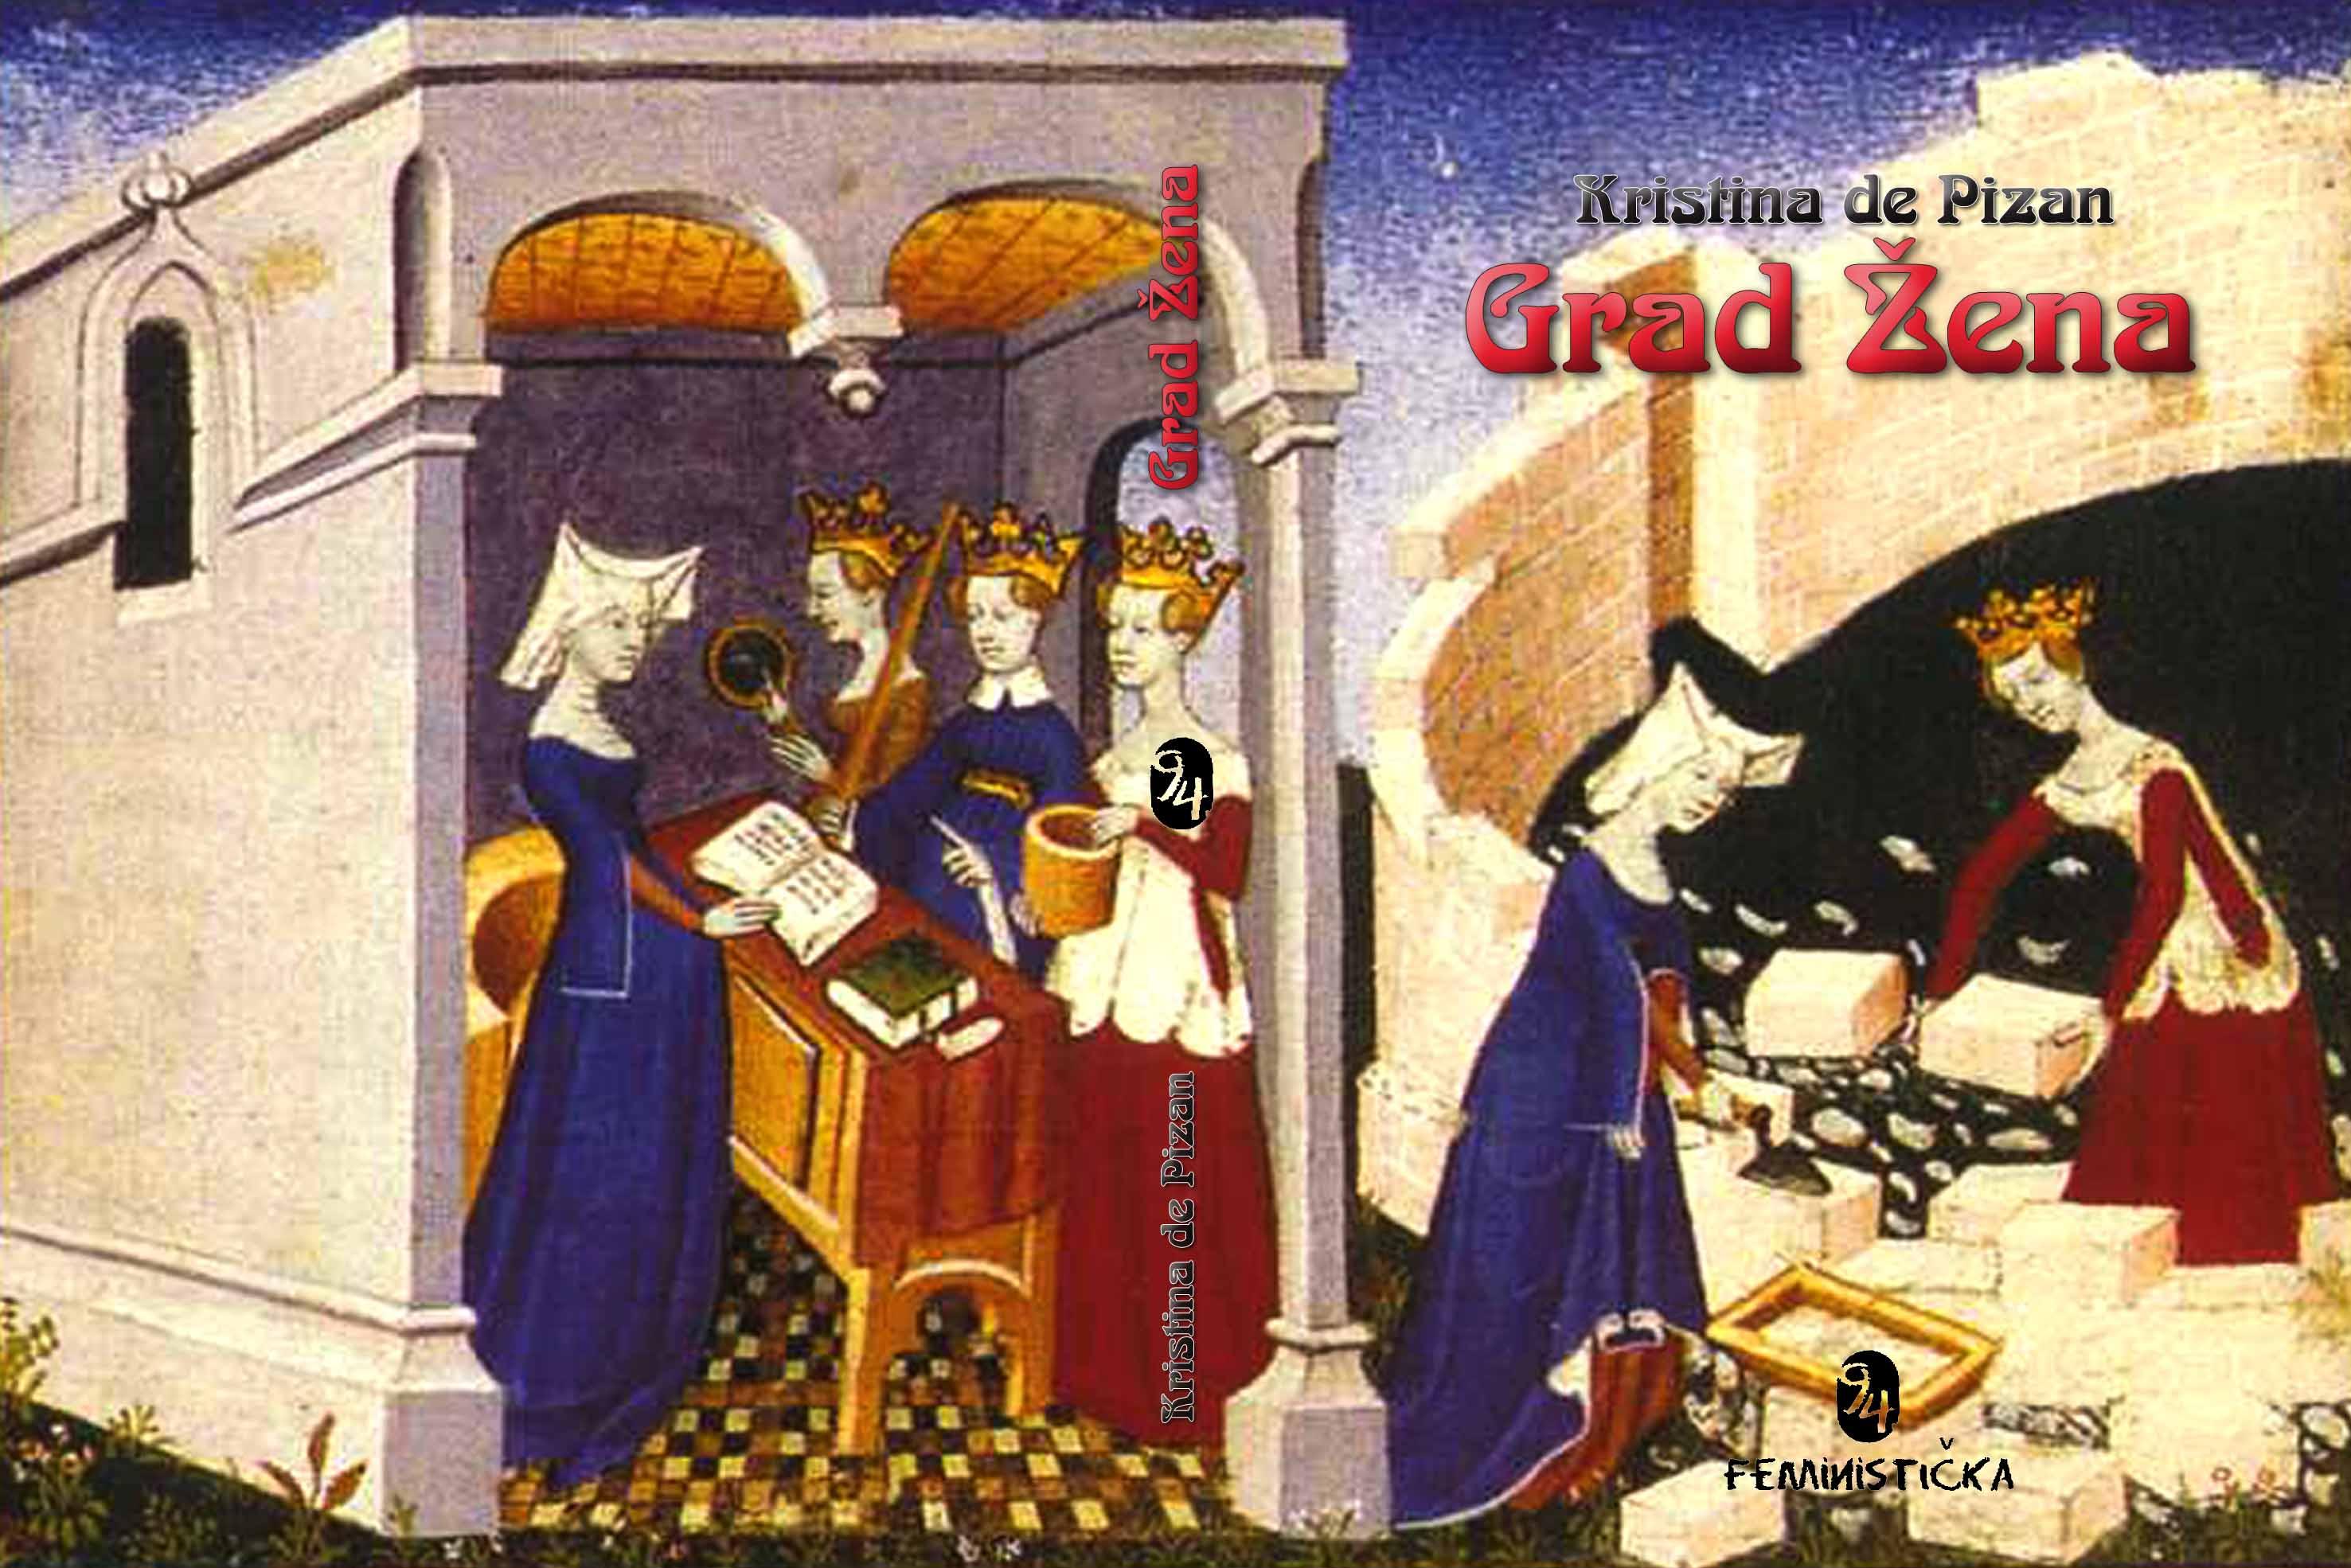 KRISTINA DE PIZAN naslovnica